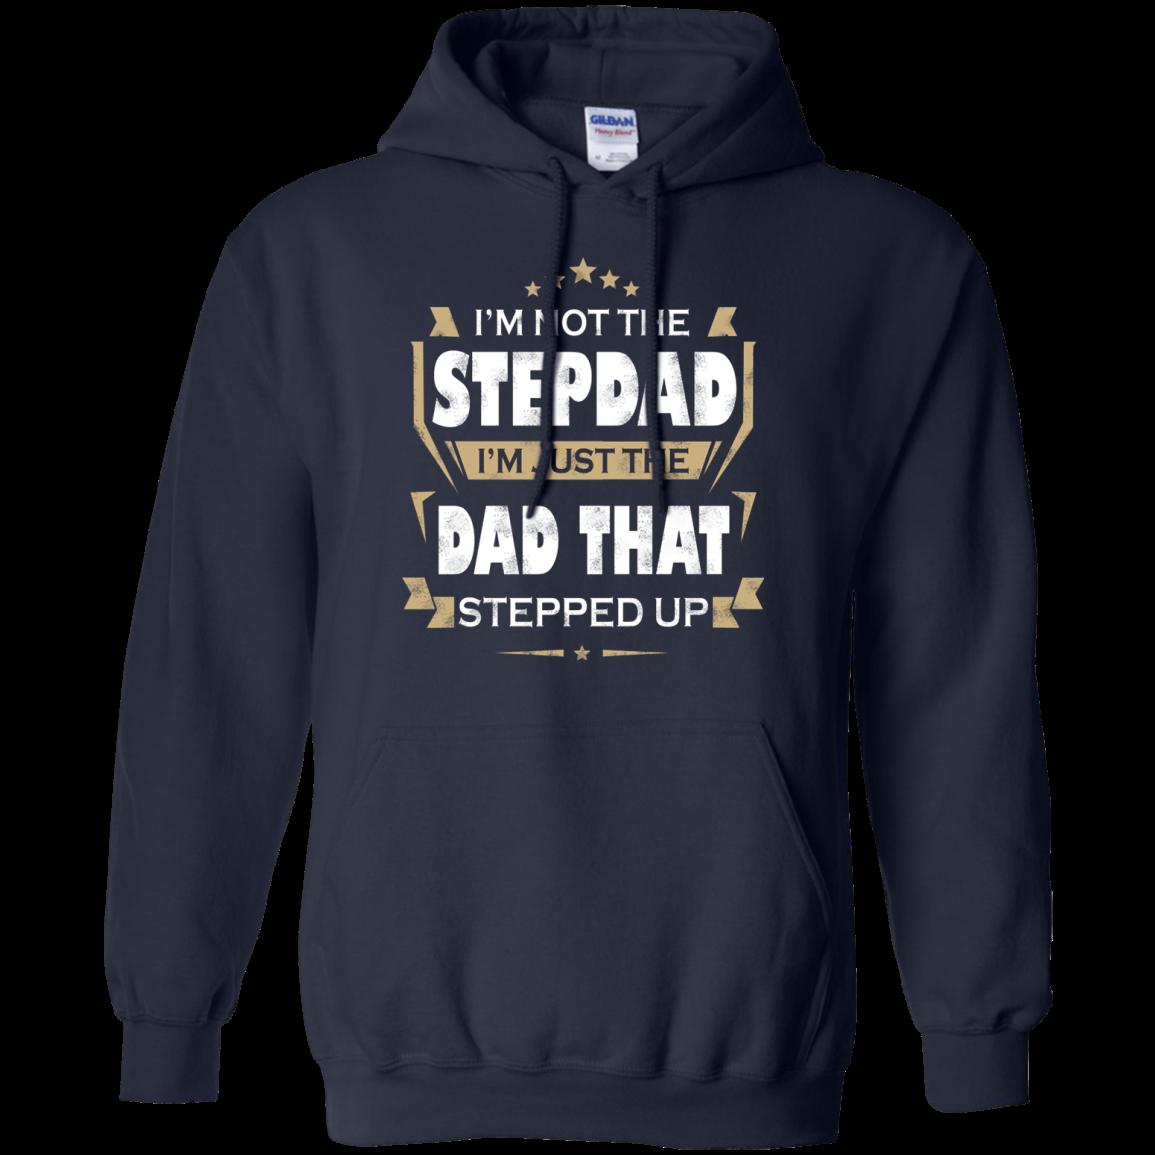 49f127b70 I'm Not The Stepdad I'm Just The Dad That Stepped Up Shirt | AllBlueTees